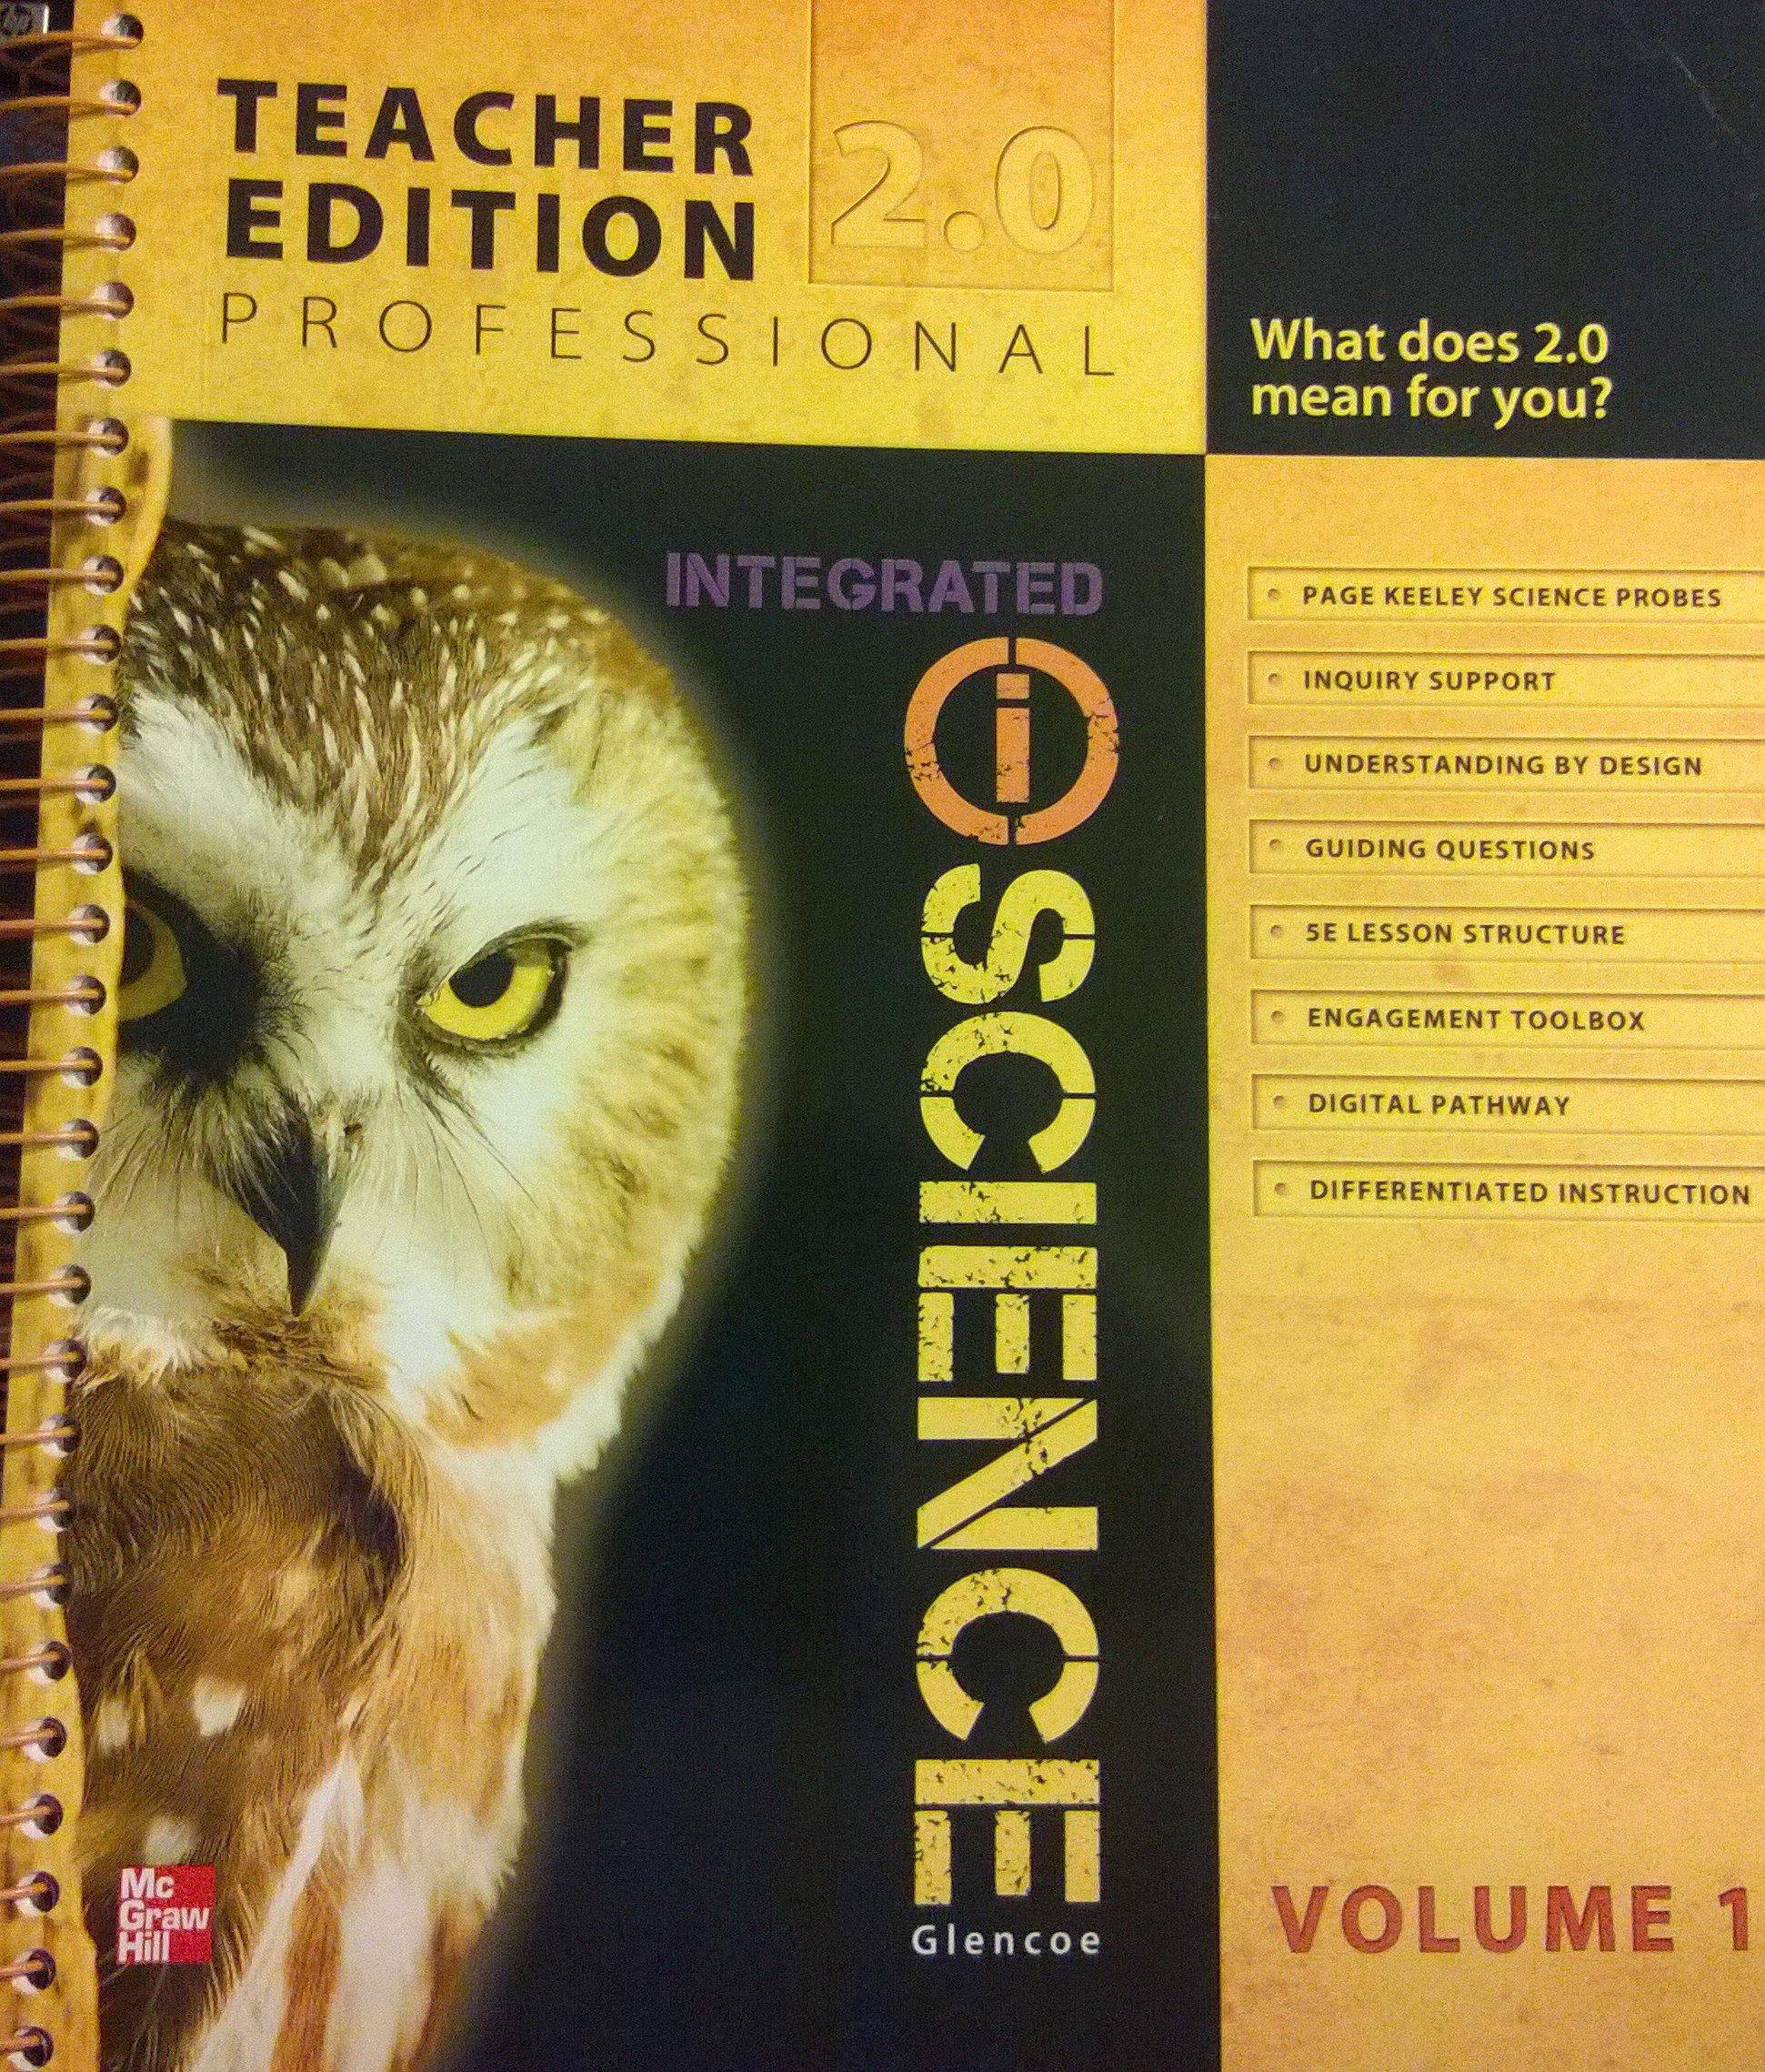 Glencoe integrated iscience course 3 grade 8 vol 1 teacher glencoe integrated iscience course 3 grade 8 vol 1 teacher edition glencoe 9780078881060 amazon books fandeluxe Choice Image